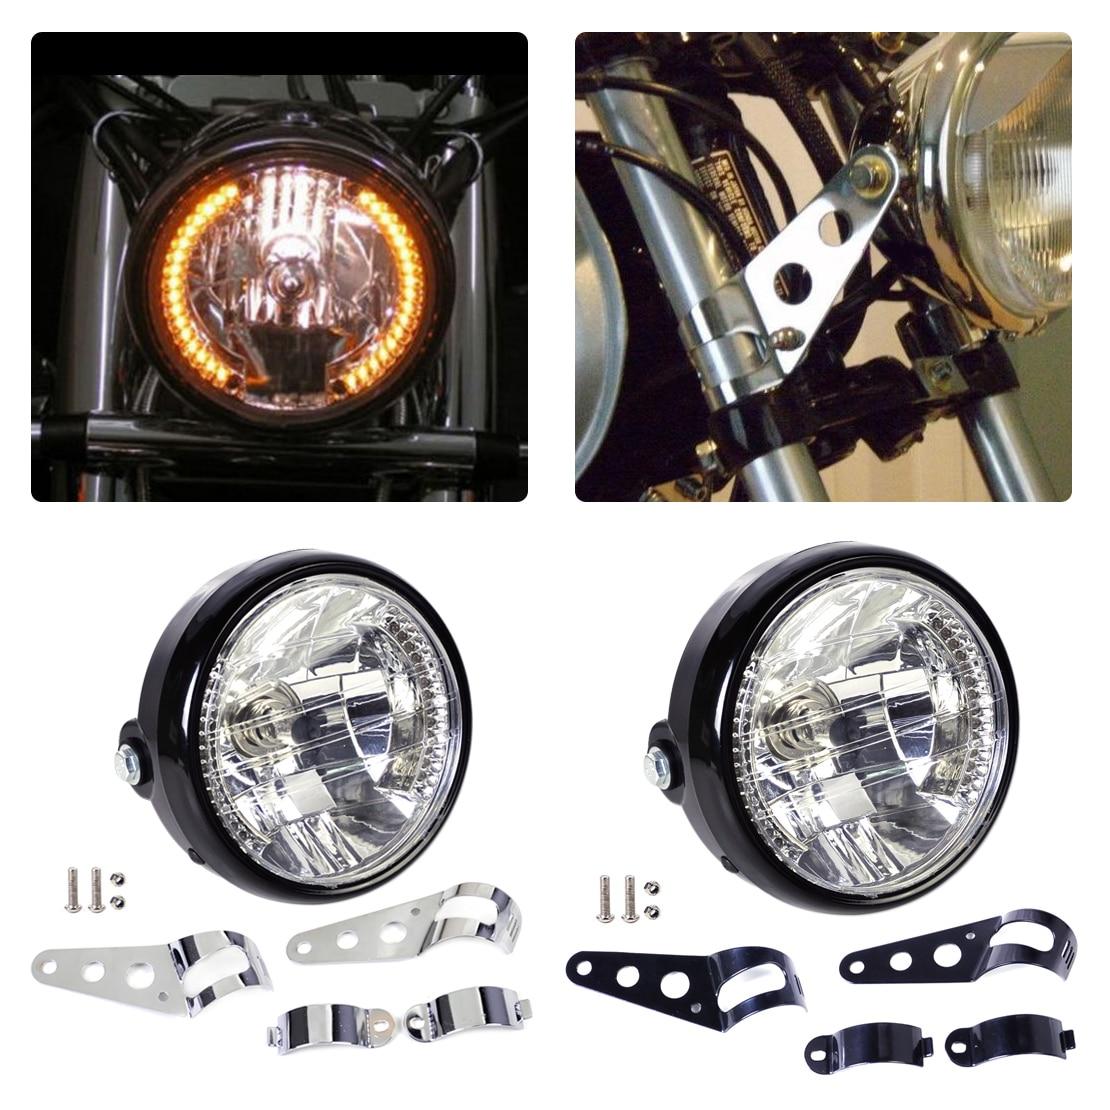 Citall 7 U0026quot  Clear Led Motorcycle Headlight Halogen Turn Signal Indicators Blinker   33 45mm